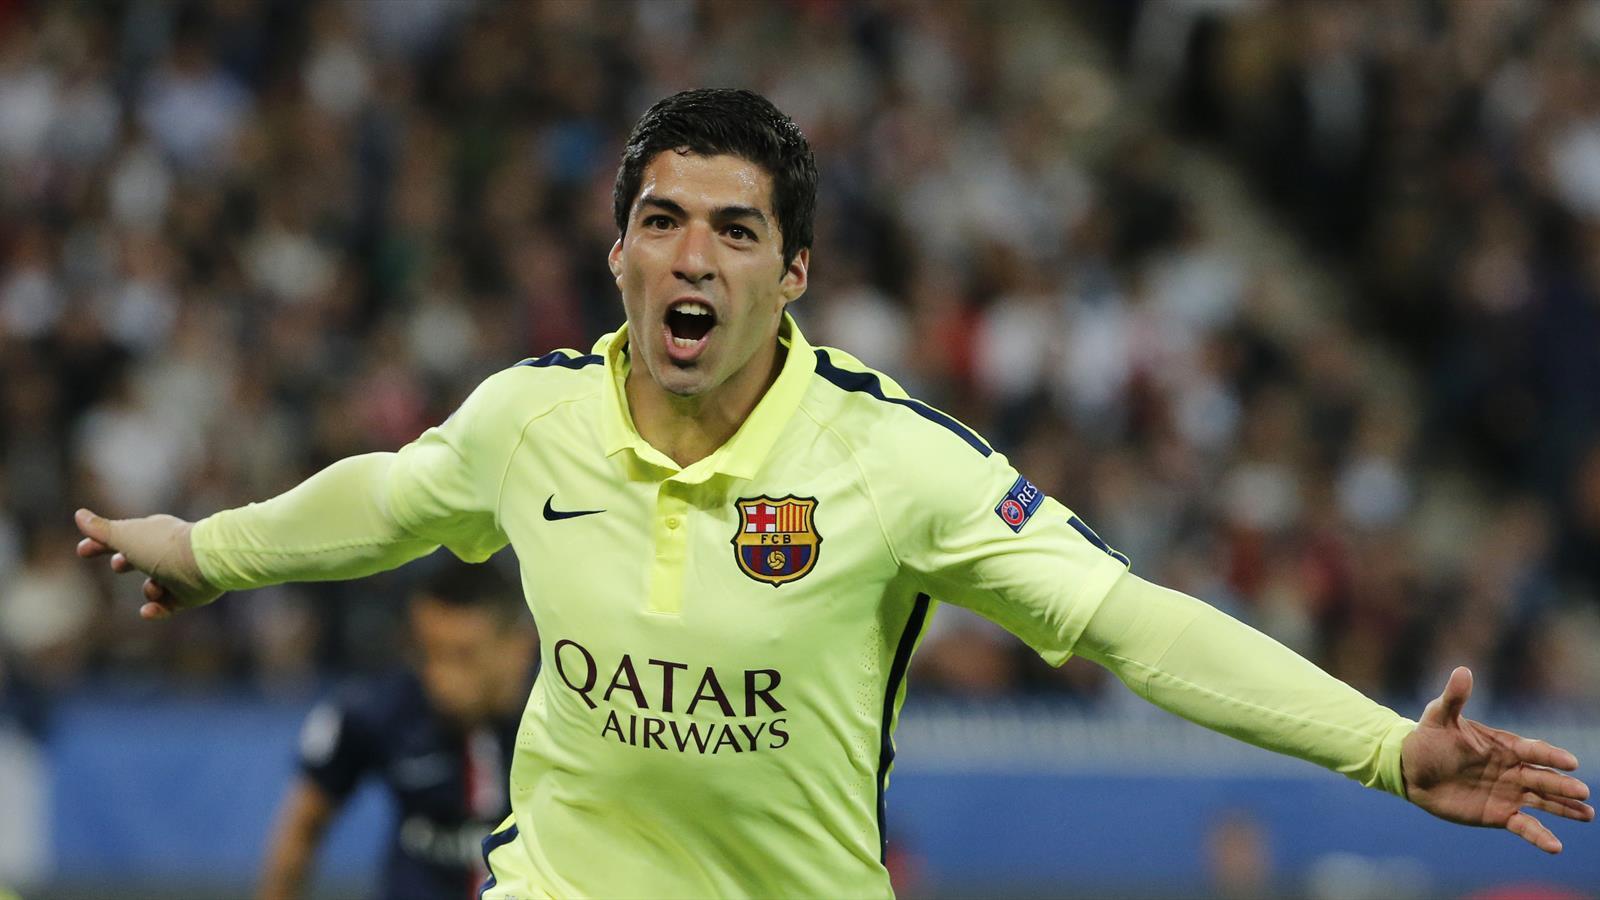 Luis Suarez scored twice in a 3-1 win at Paris Saint-Germain.